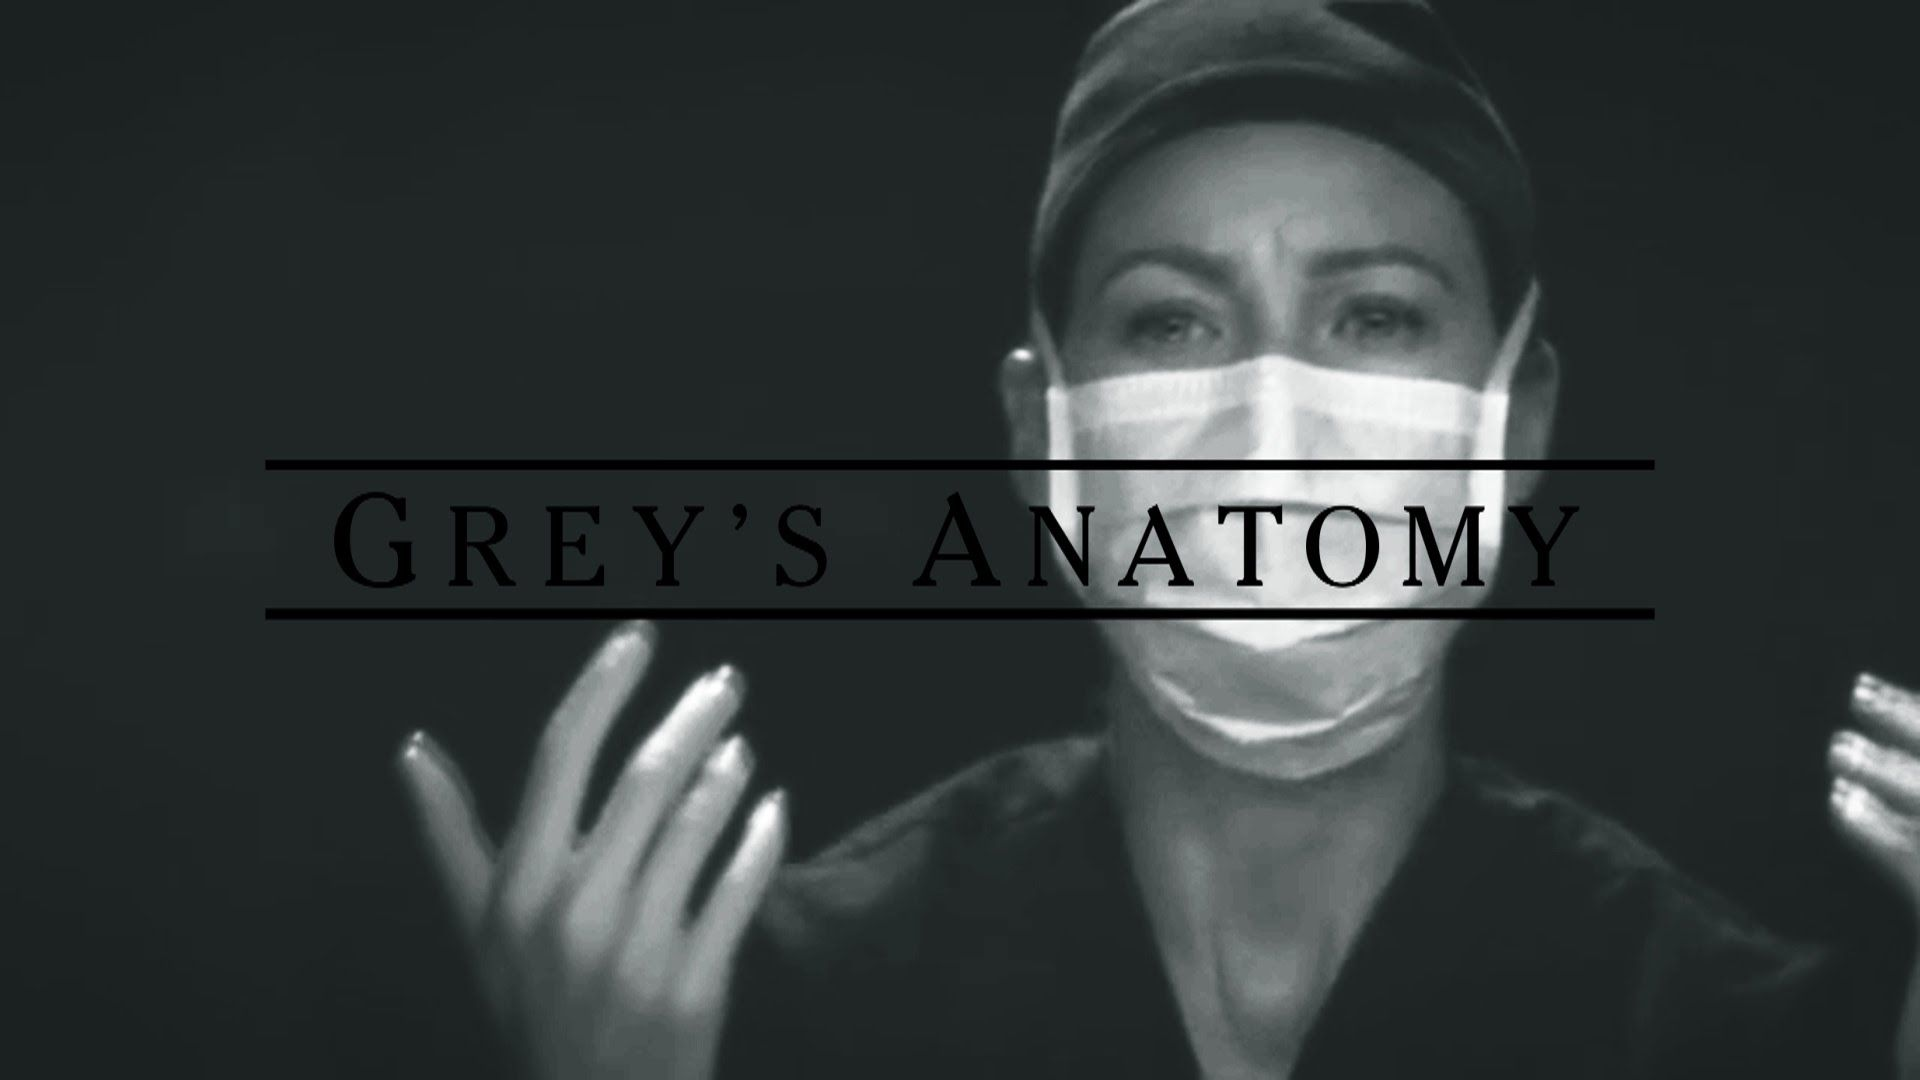 Greys Anatomy Wallpapers Top Free Greys Anatomy